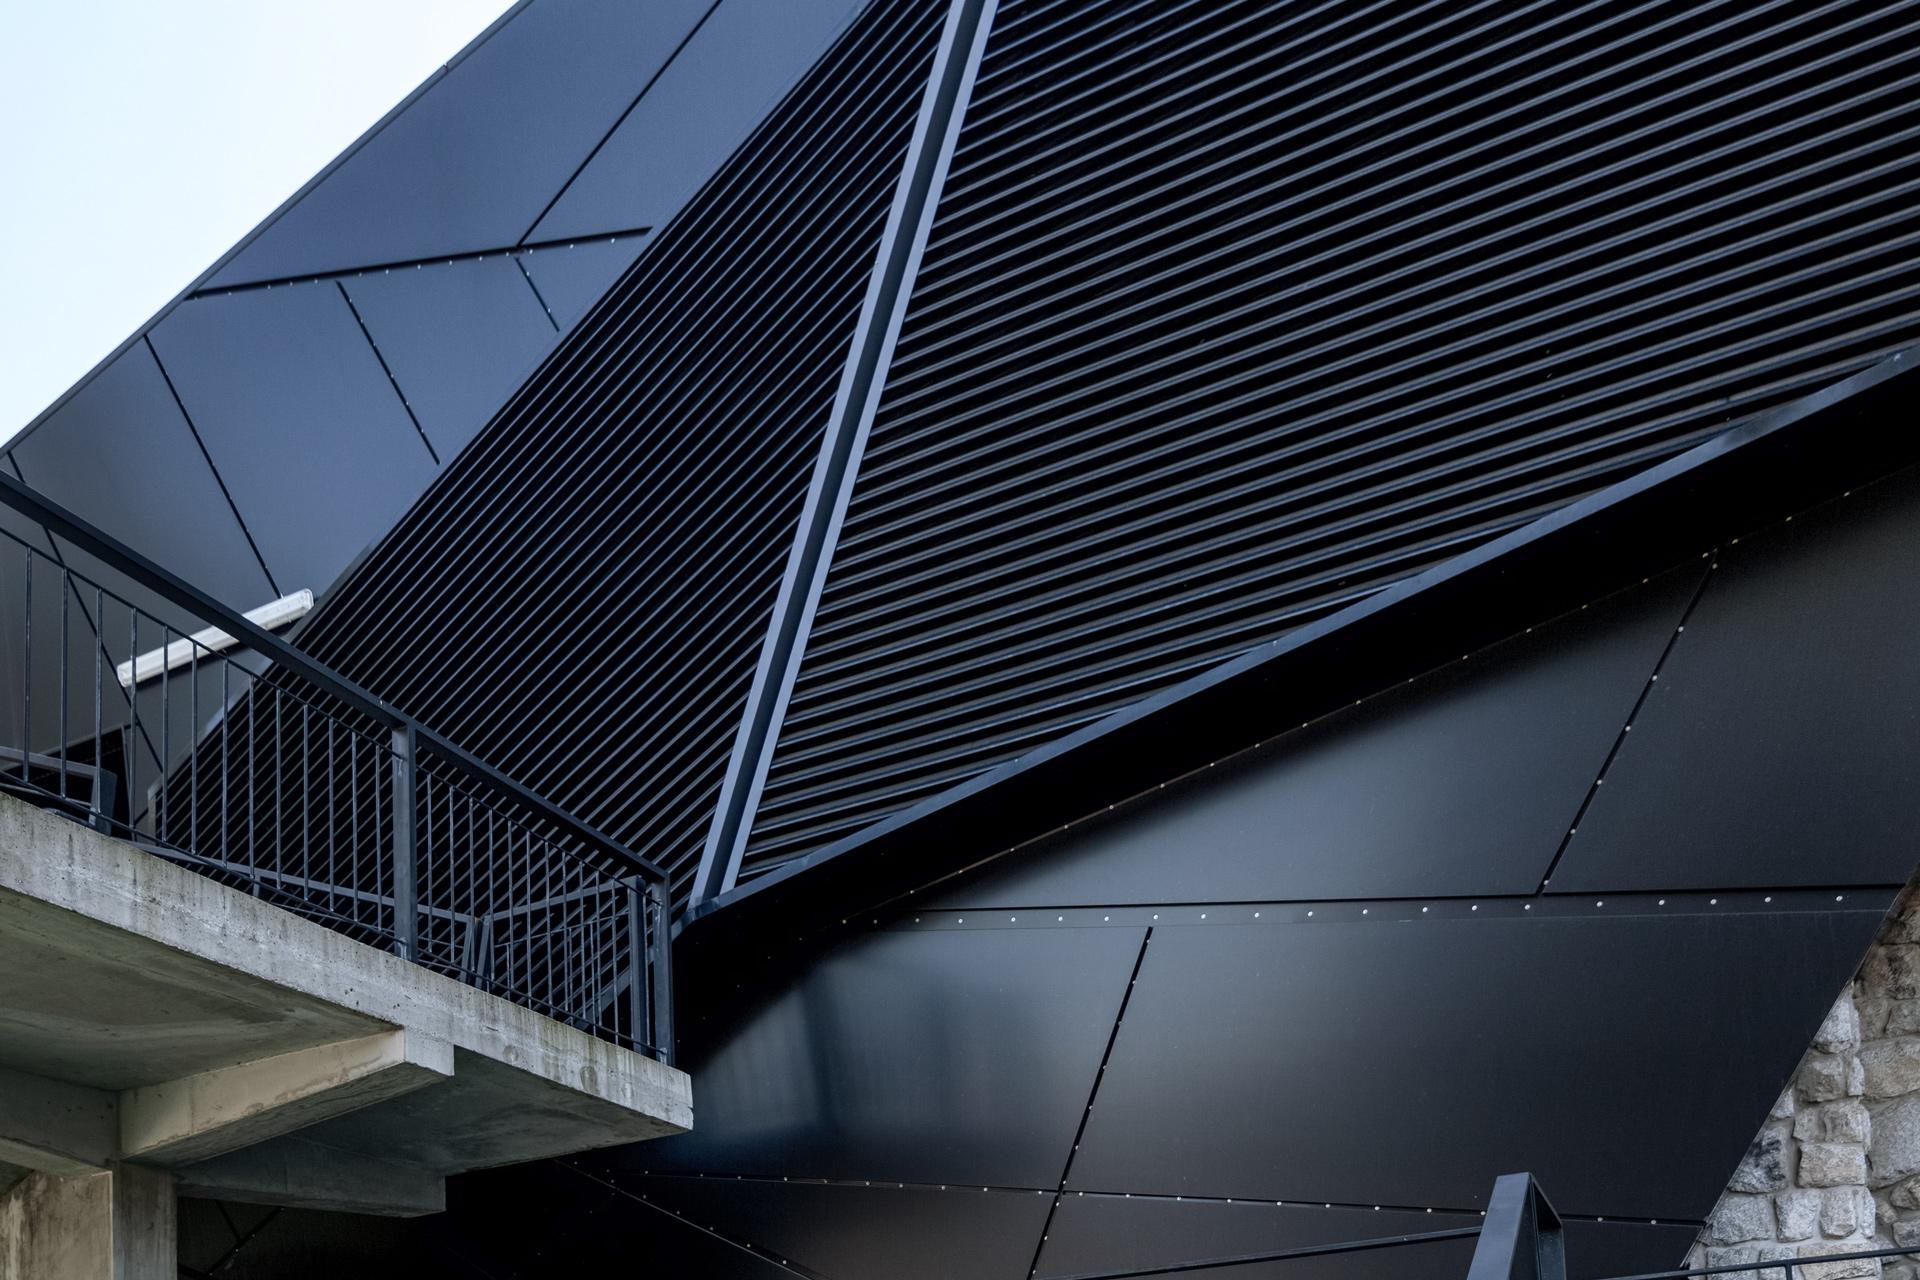 edificio-detalle-STB-451